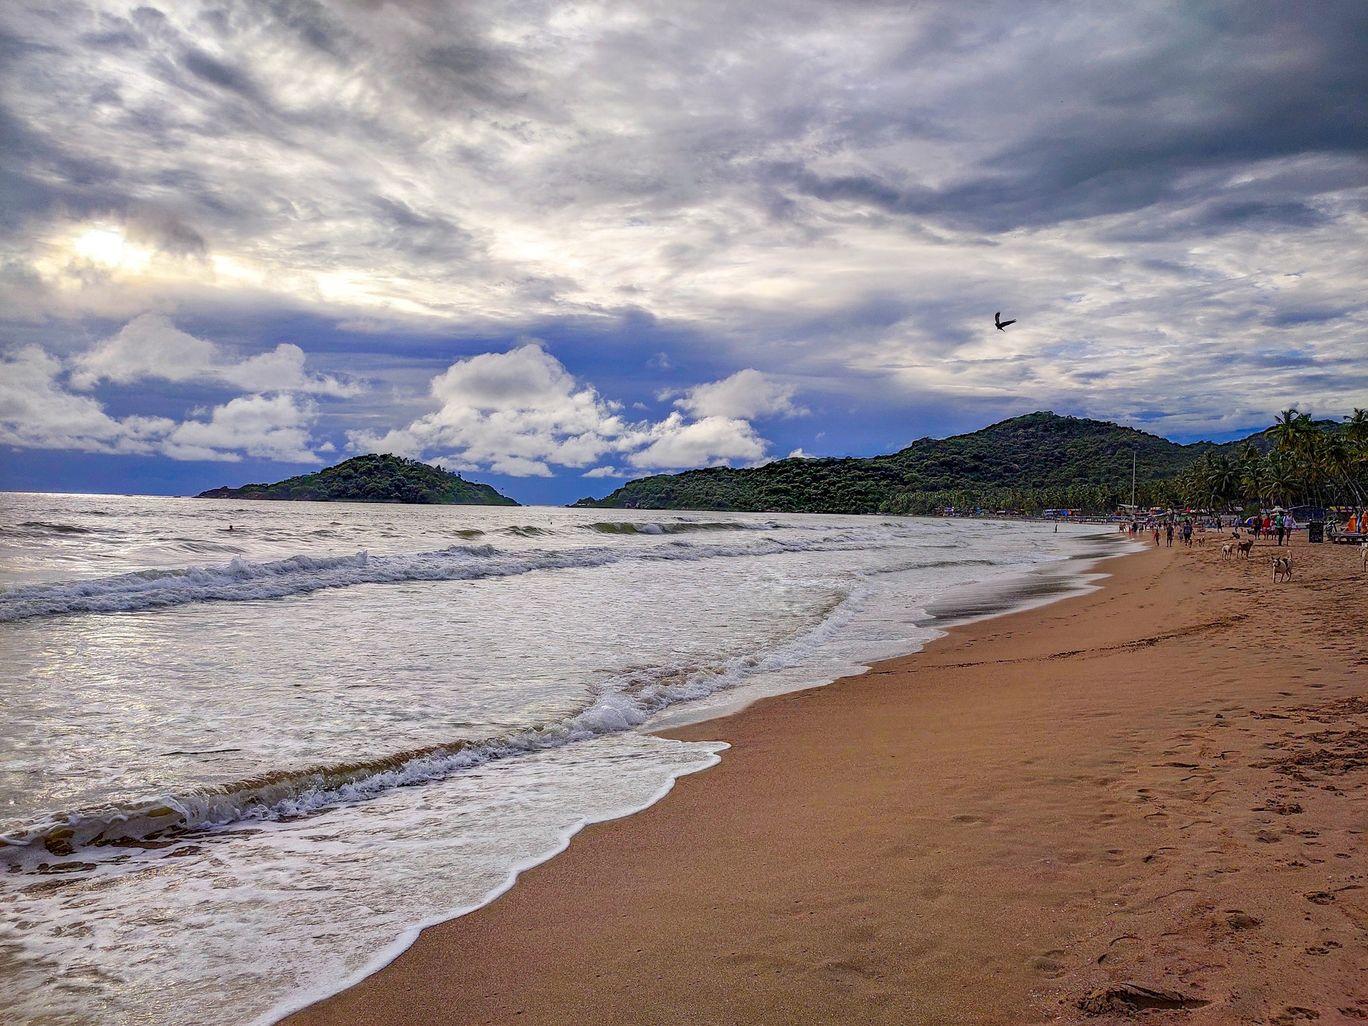 Photo of Goa By shashikant prajapati